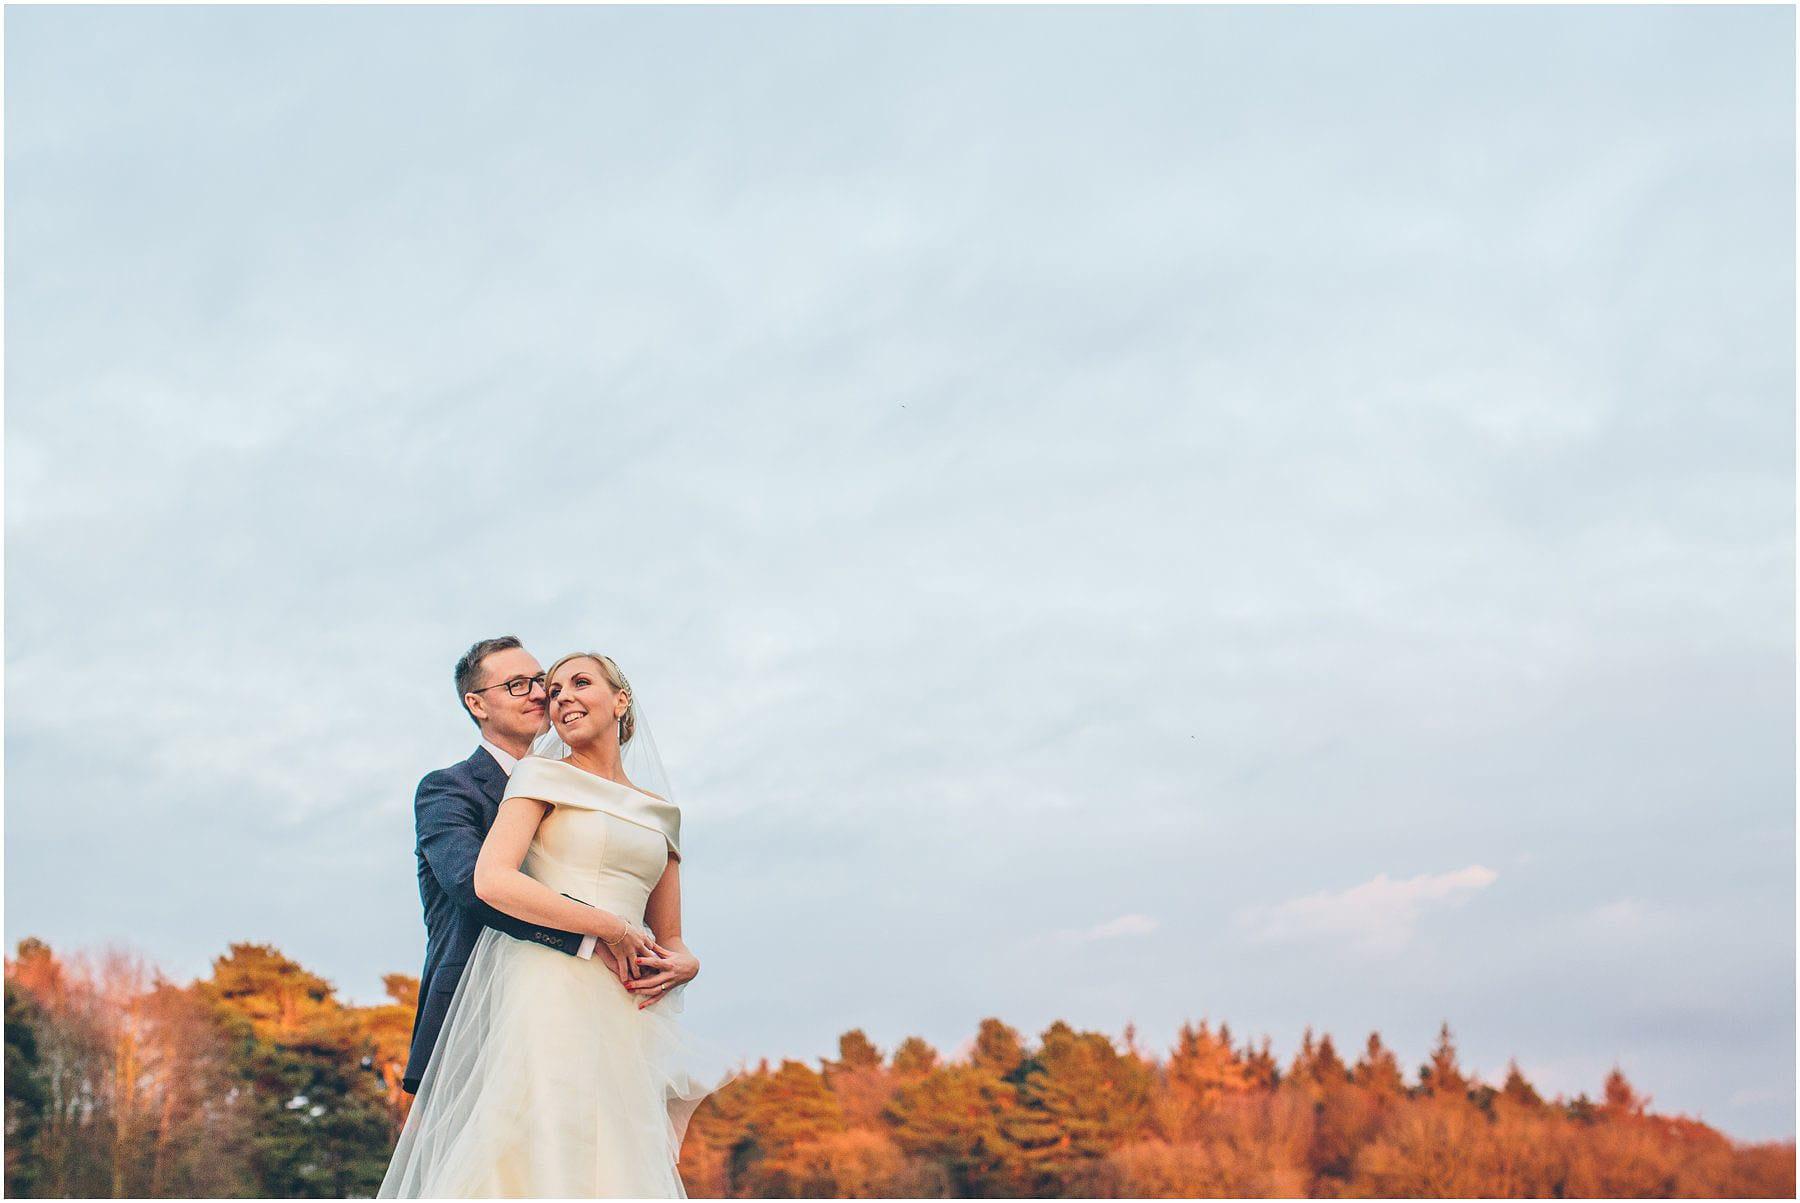 Capesthorne_Hall_Wedding_Photography_0131